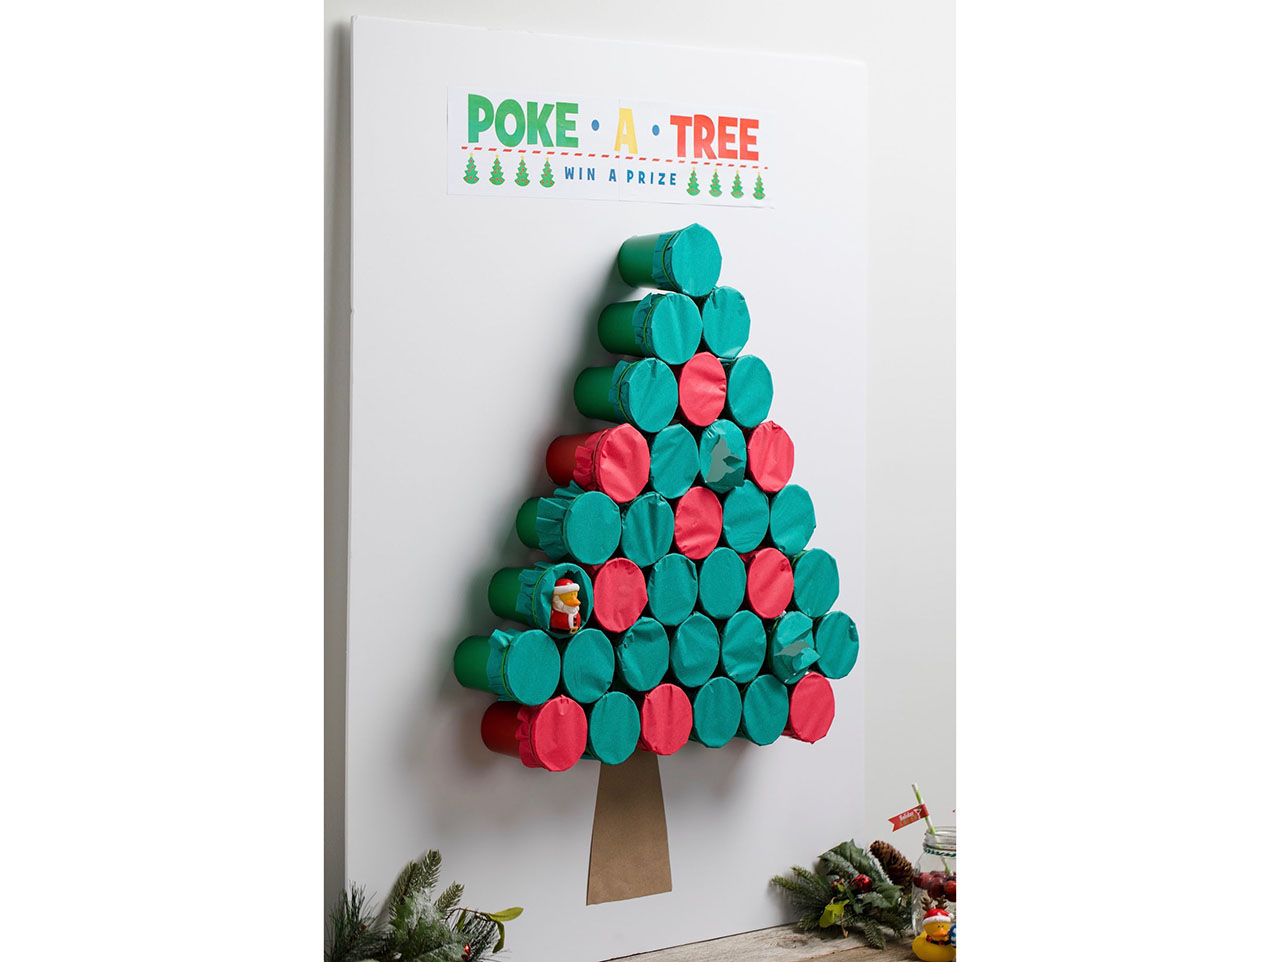 poke-tree-game-idea-project